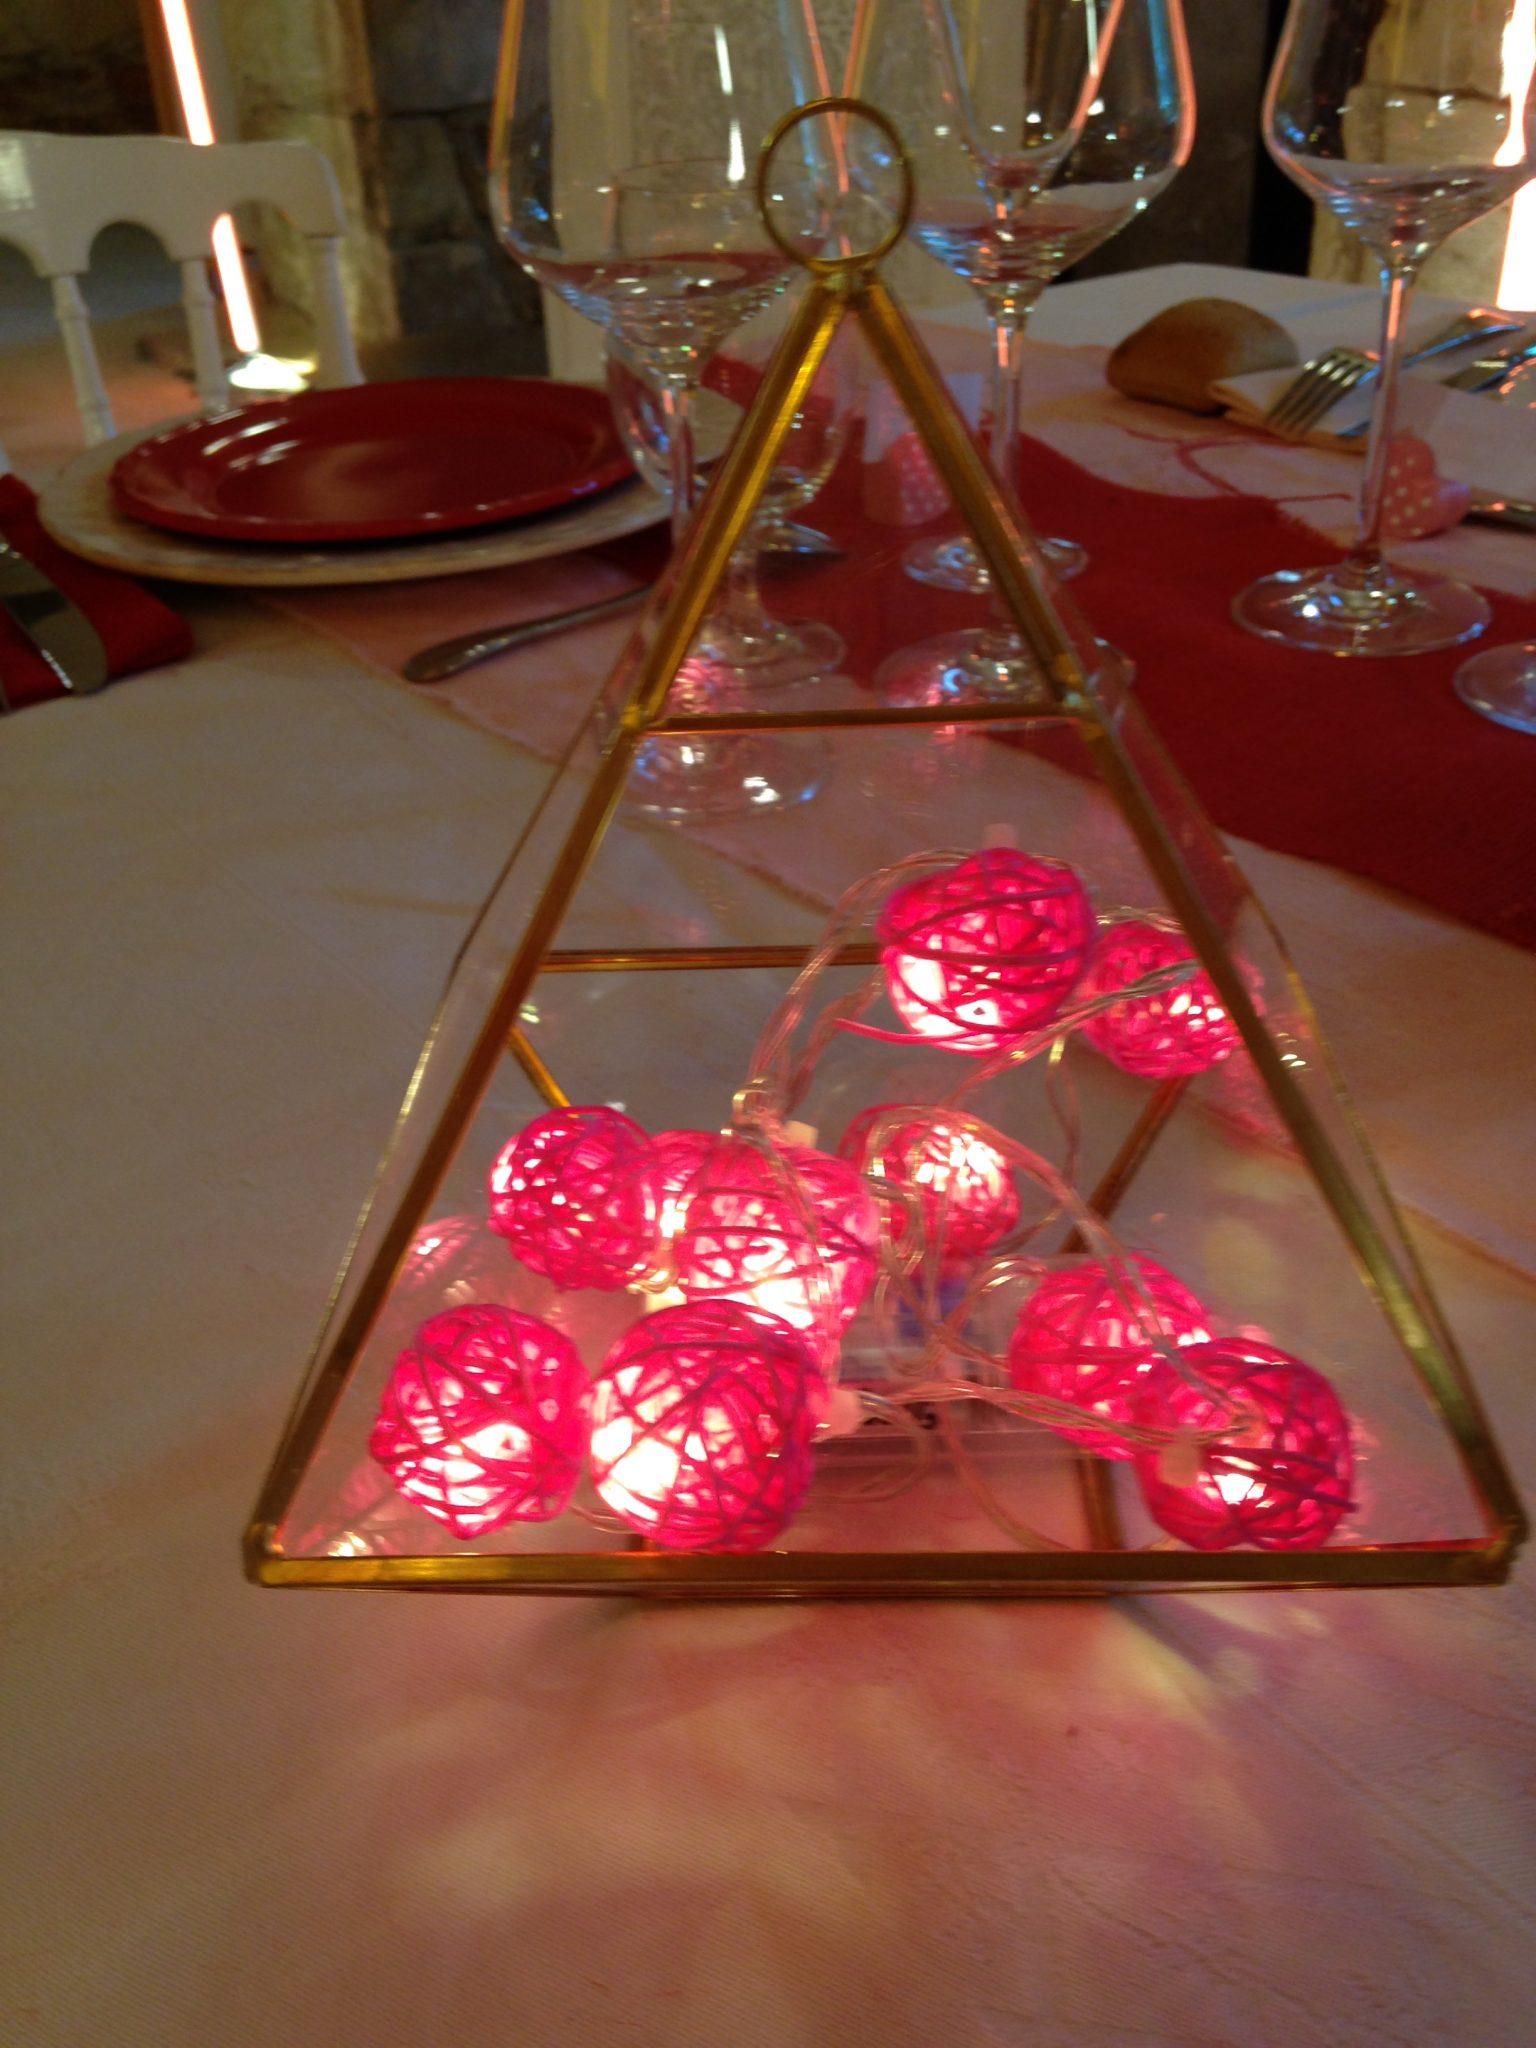 guirlande led rose lumineuse table mariés au premier regard m6 2017 saison 2